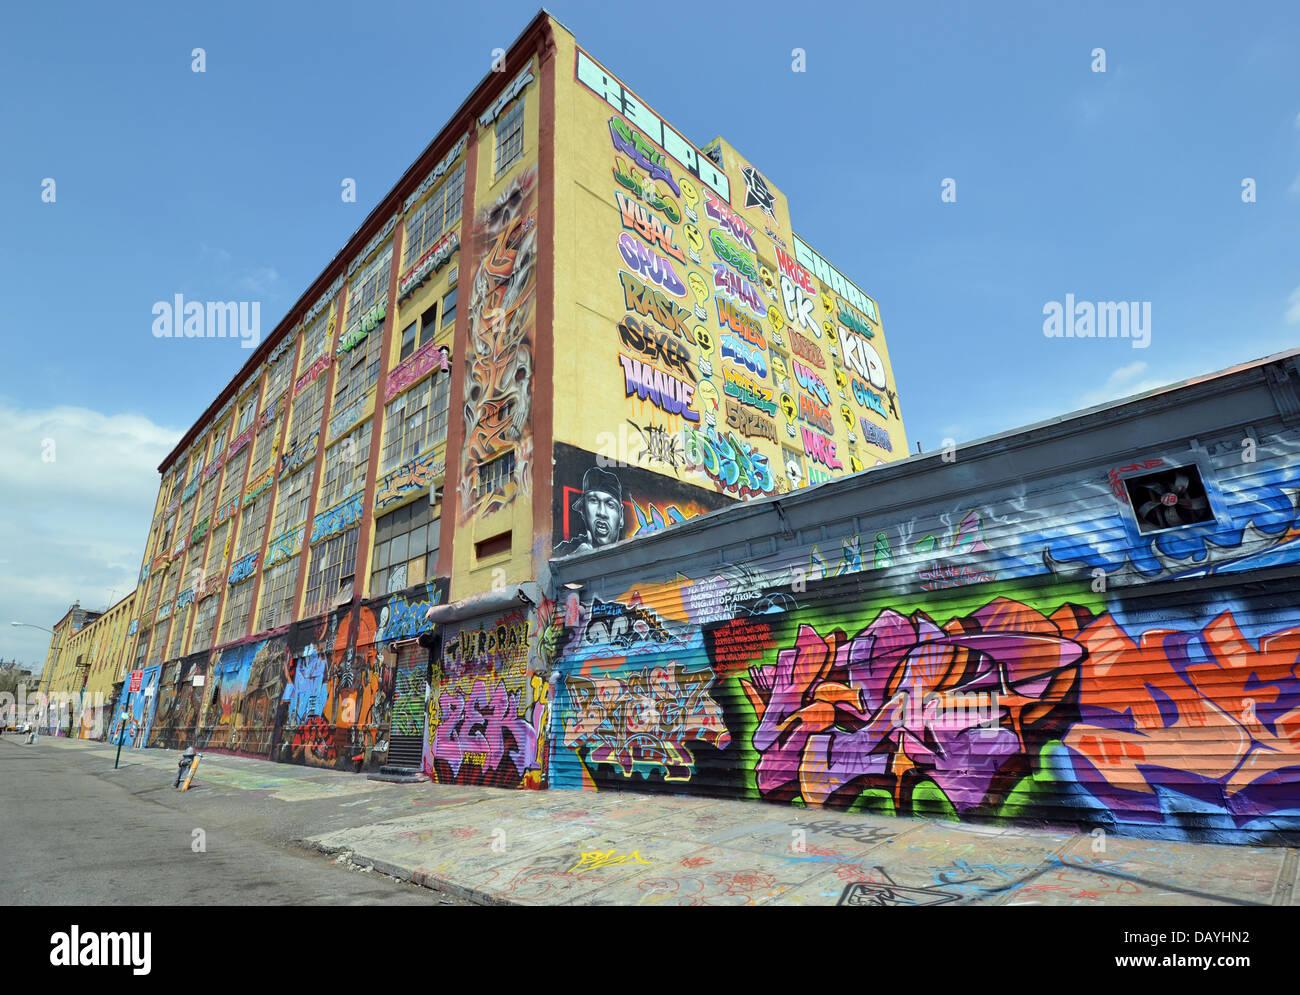 5 pointz graffiti museum in long island city queens new york